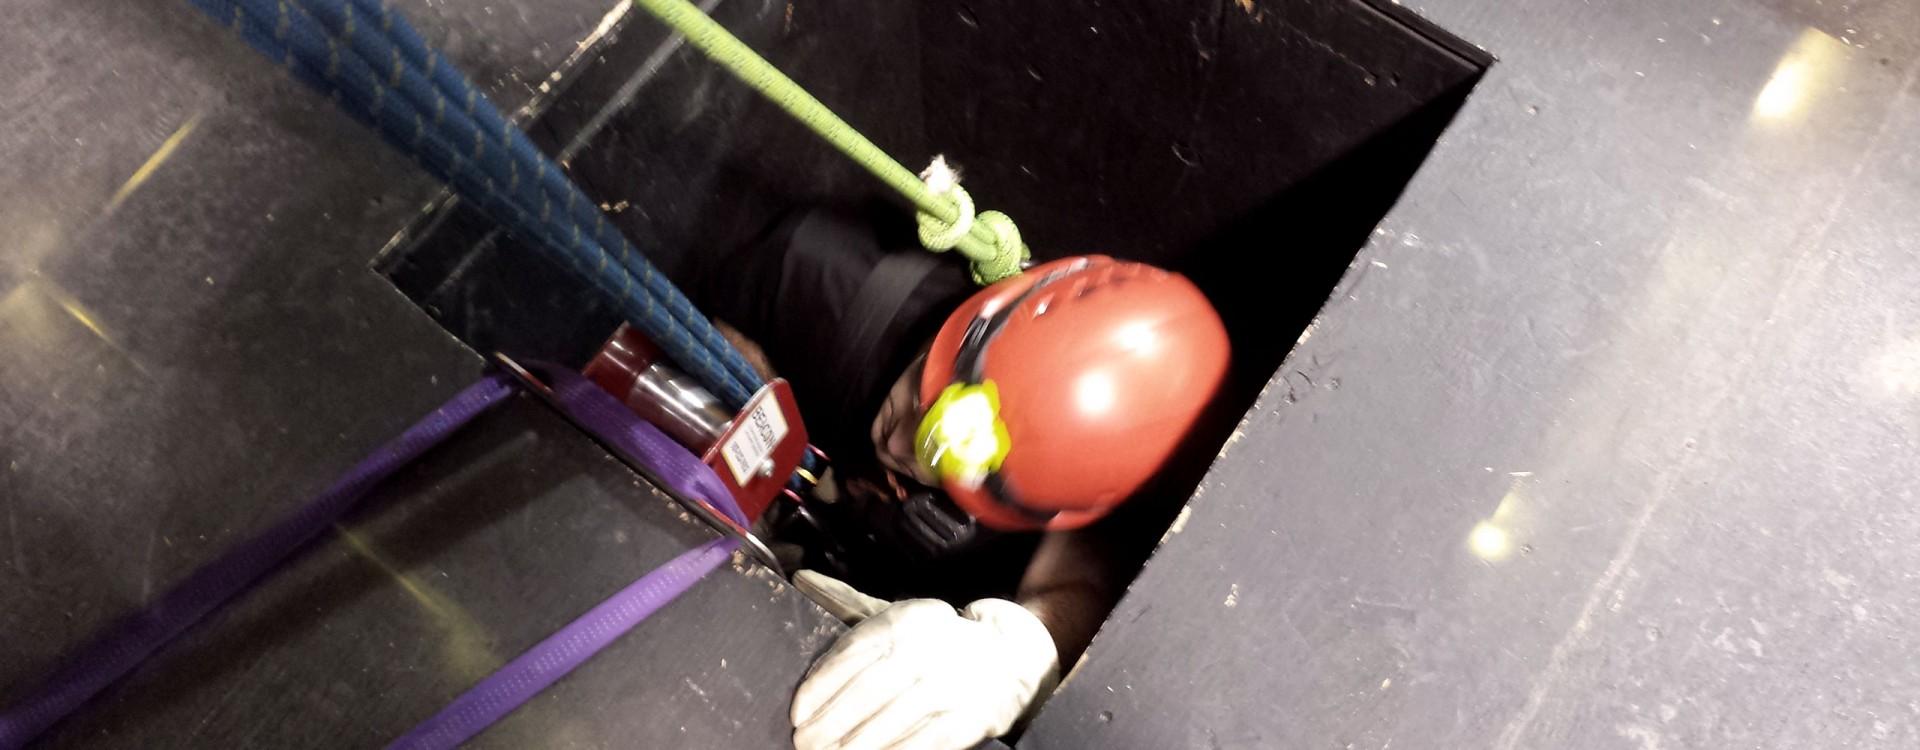 Confined Space Rescue Training - OSHA & NFPA - Beacon